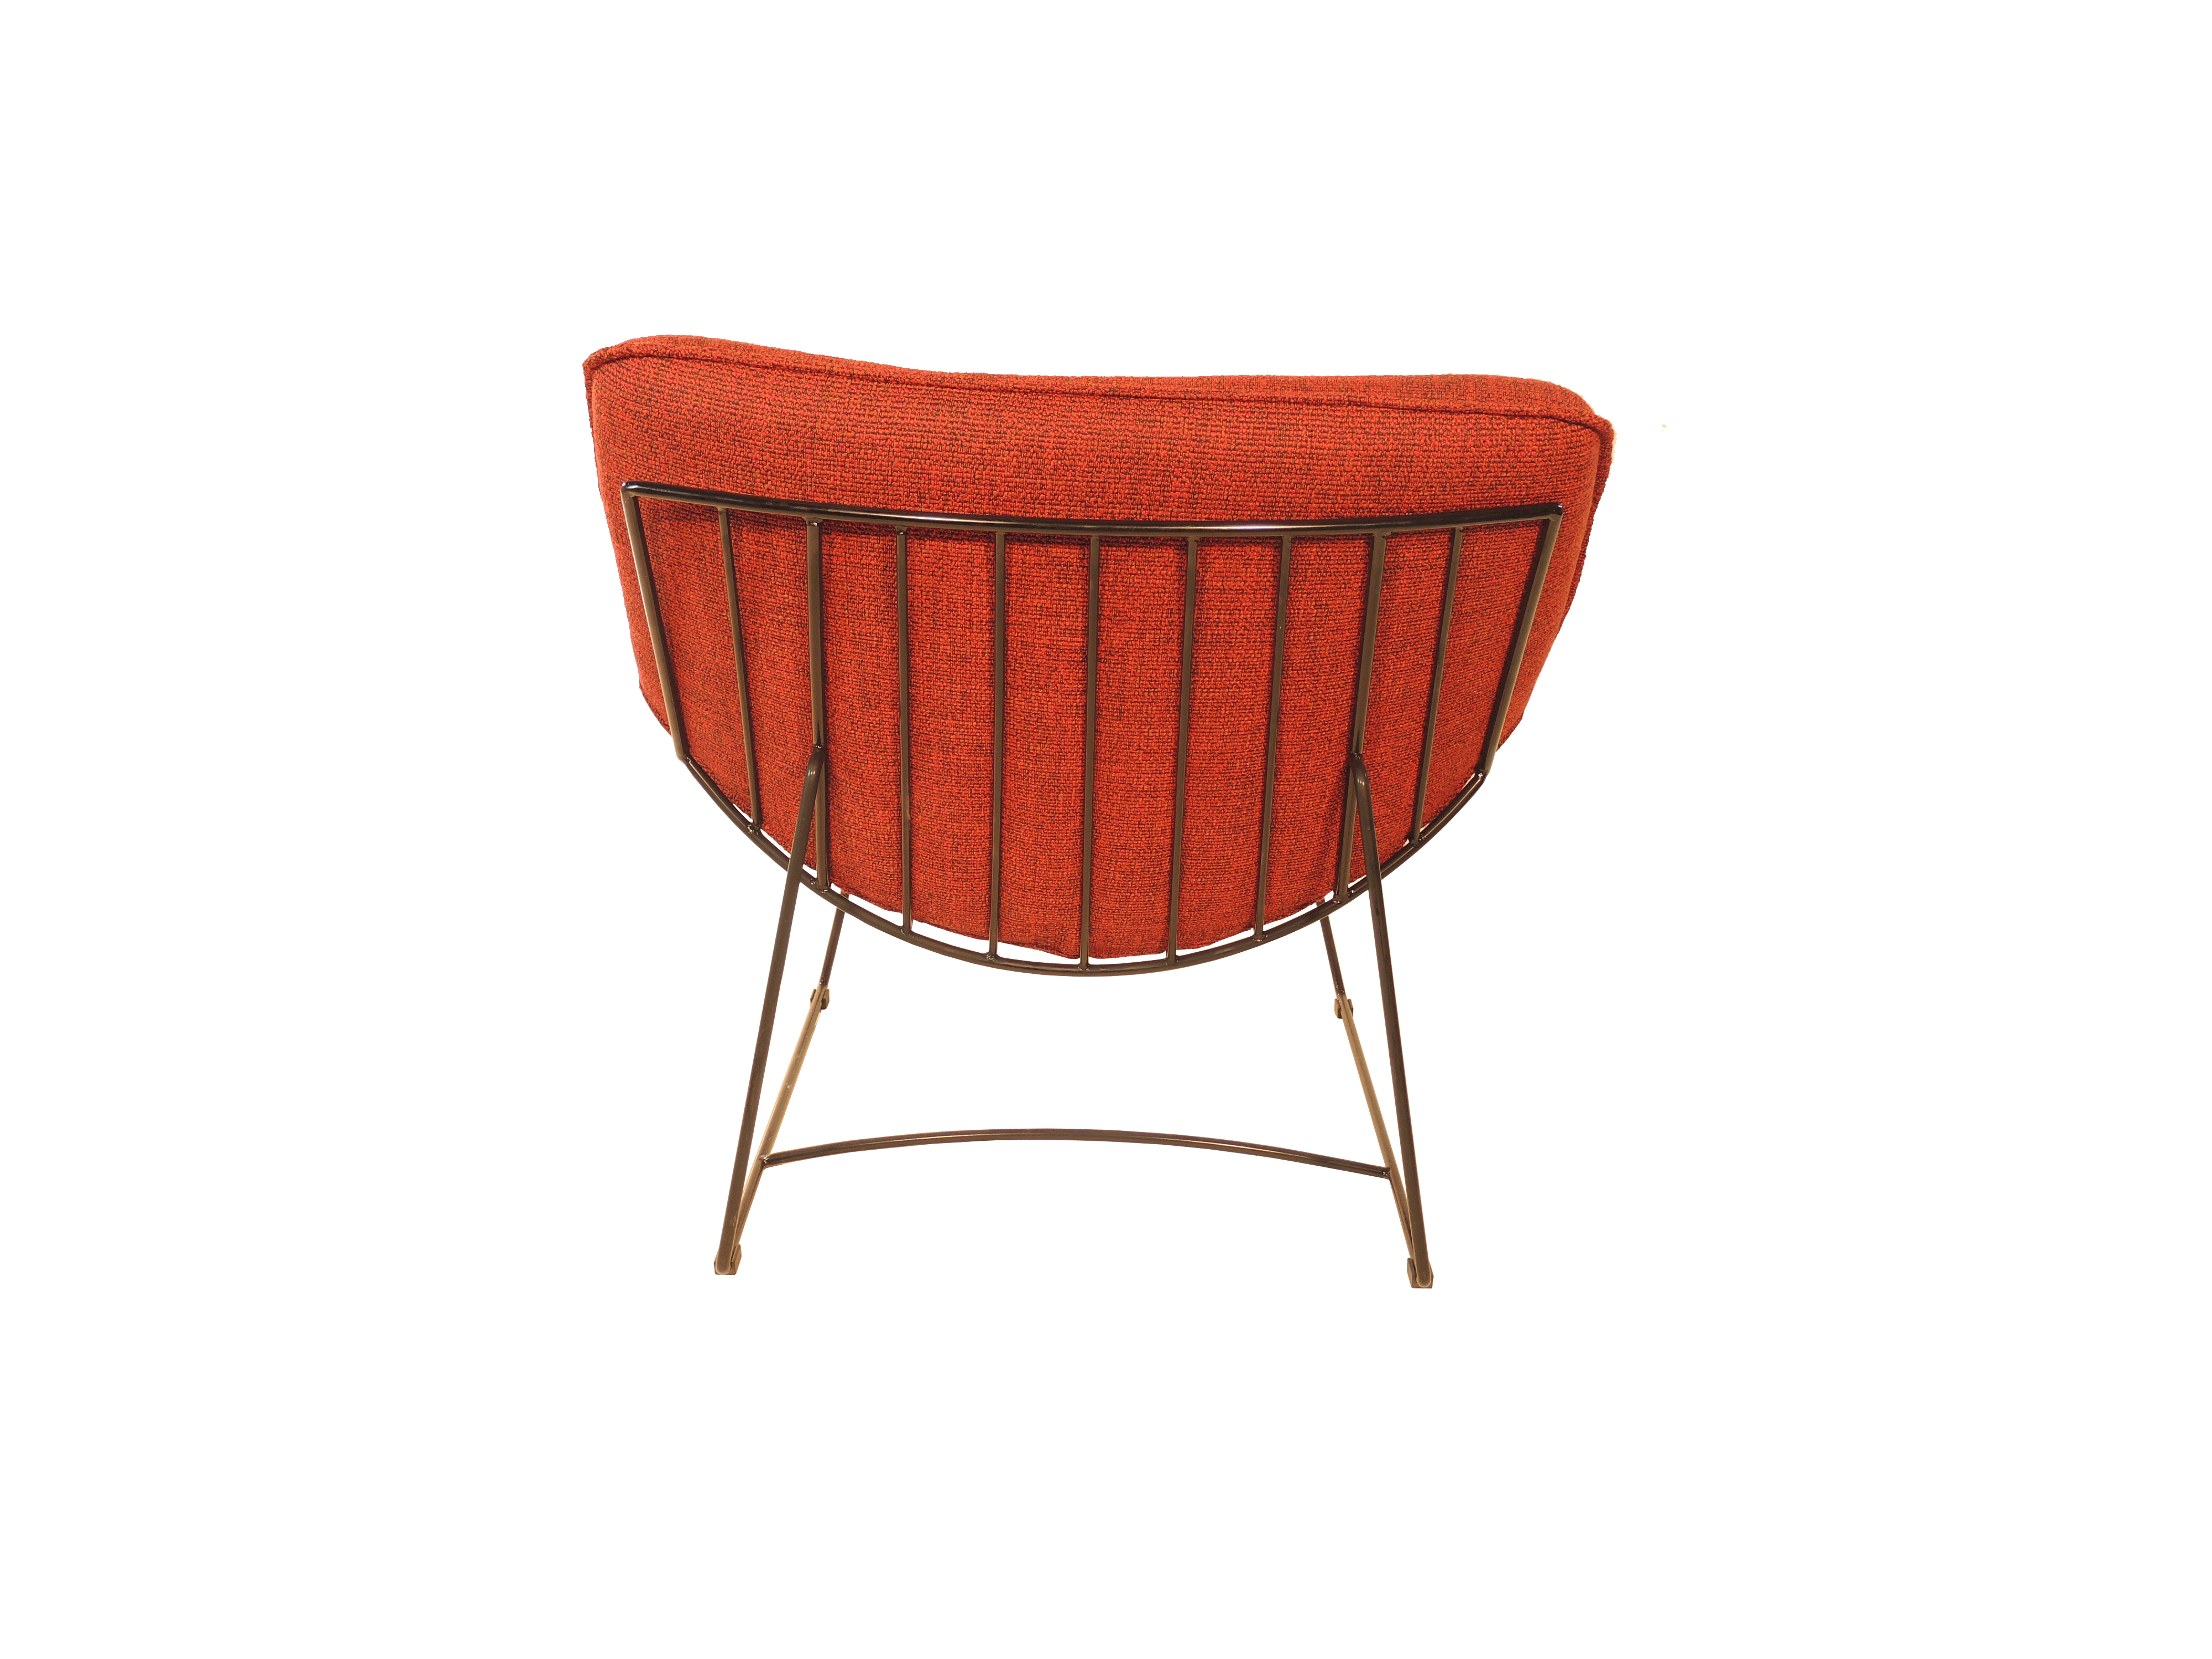 Leandro - Design fauteuil Nederland fabricaat